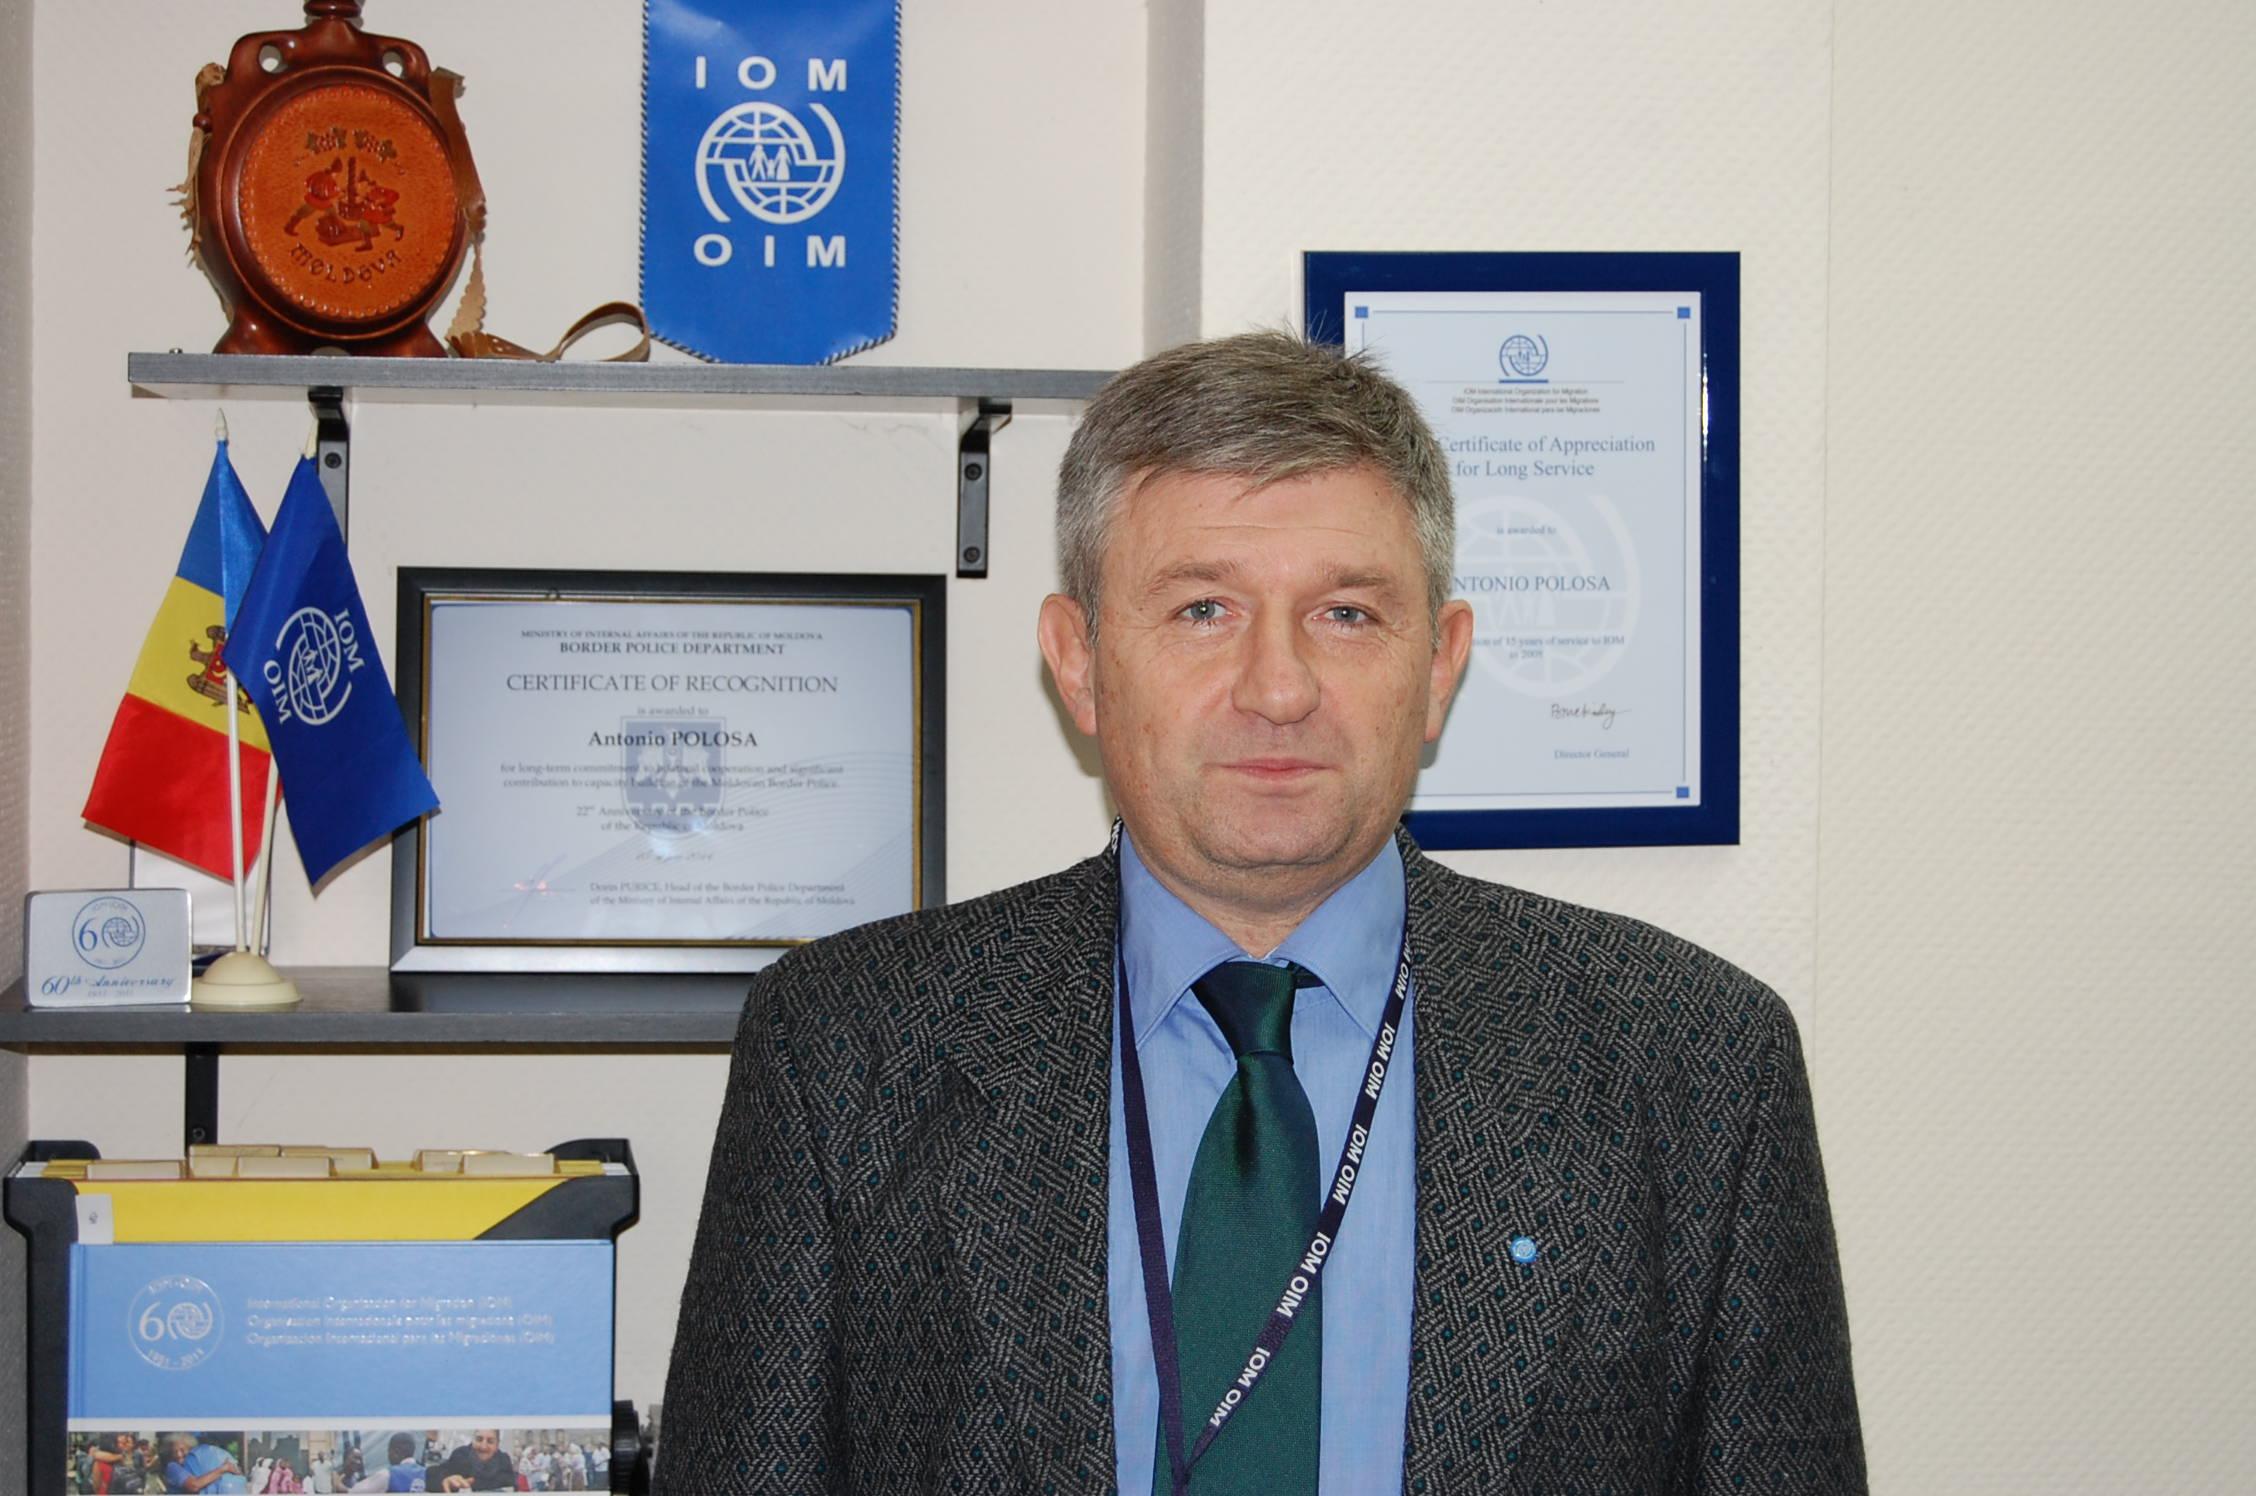 Intervista ad Antonio Polosa (IOM Moldova)